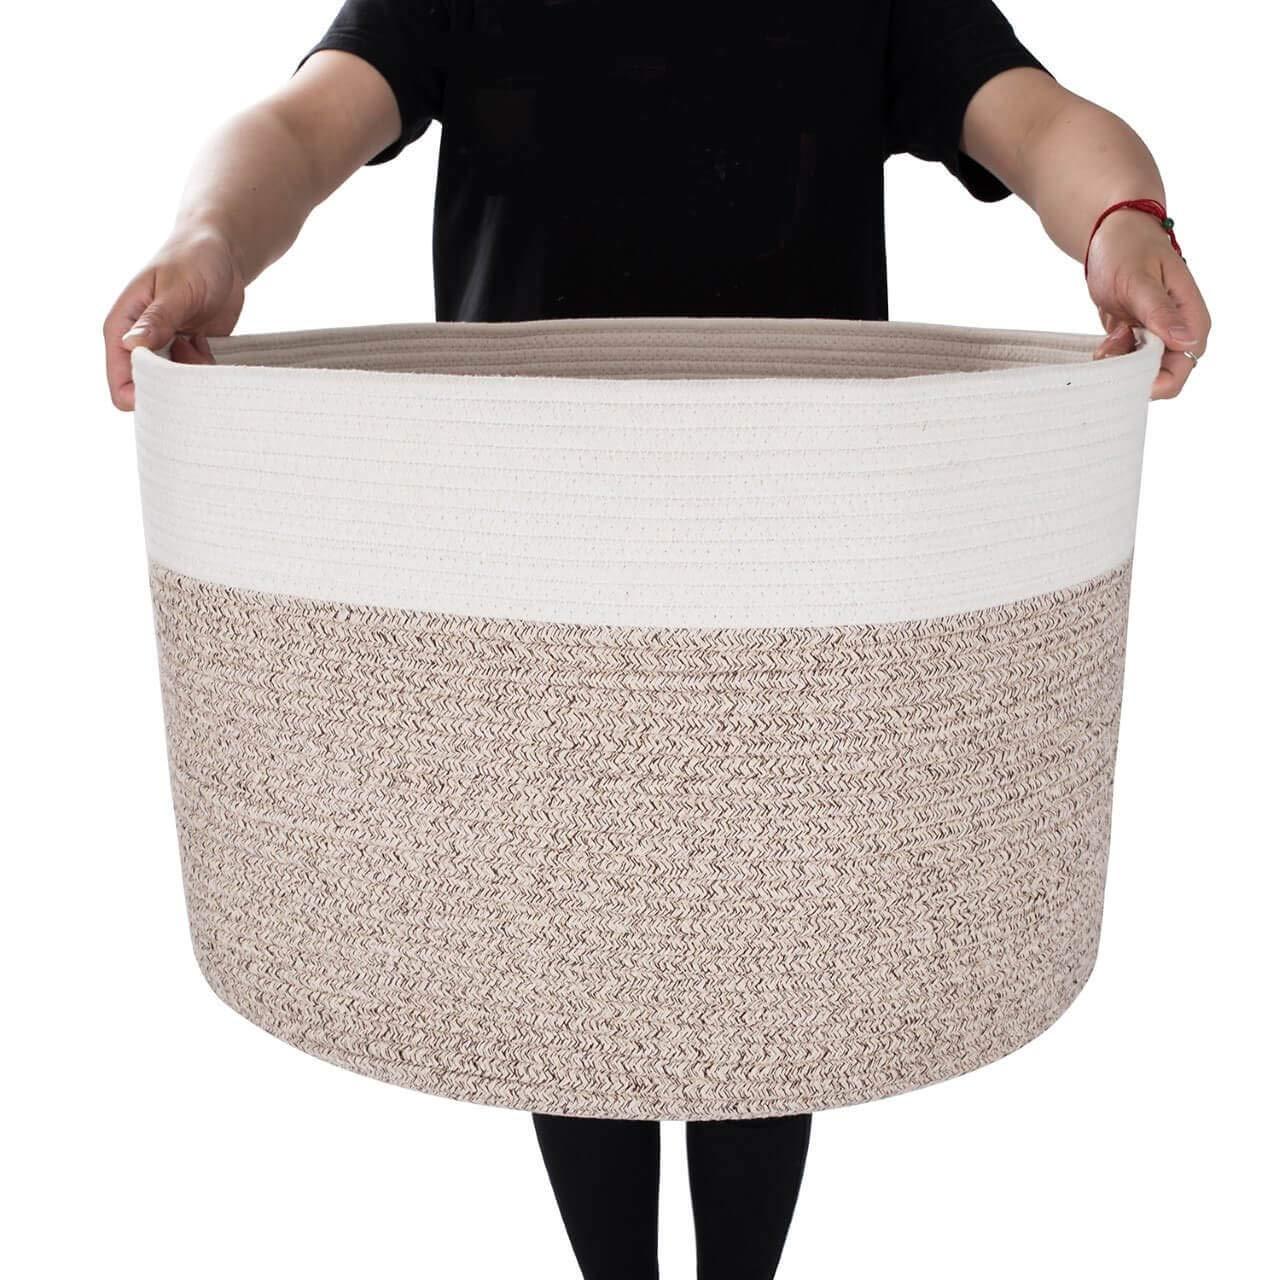 "MINTWOOD Design XXXL Extra Large 22"" X 22"" X 14"" Decorative Woven Cotton Rope Basket, Laundry Basket, Blanket Basket, Baby & Dog Toy Storage Baskets & Bin, Kid Laundry Hamper - Natural/Heathered Cream"